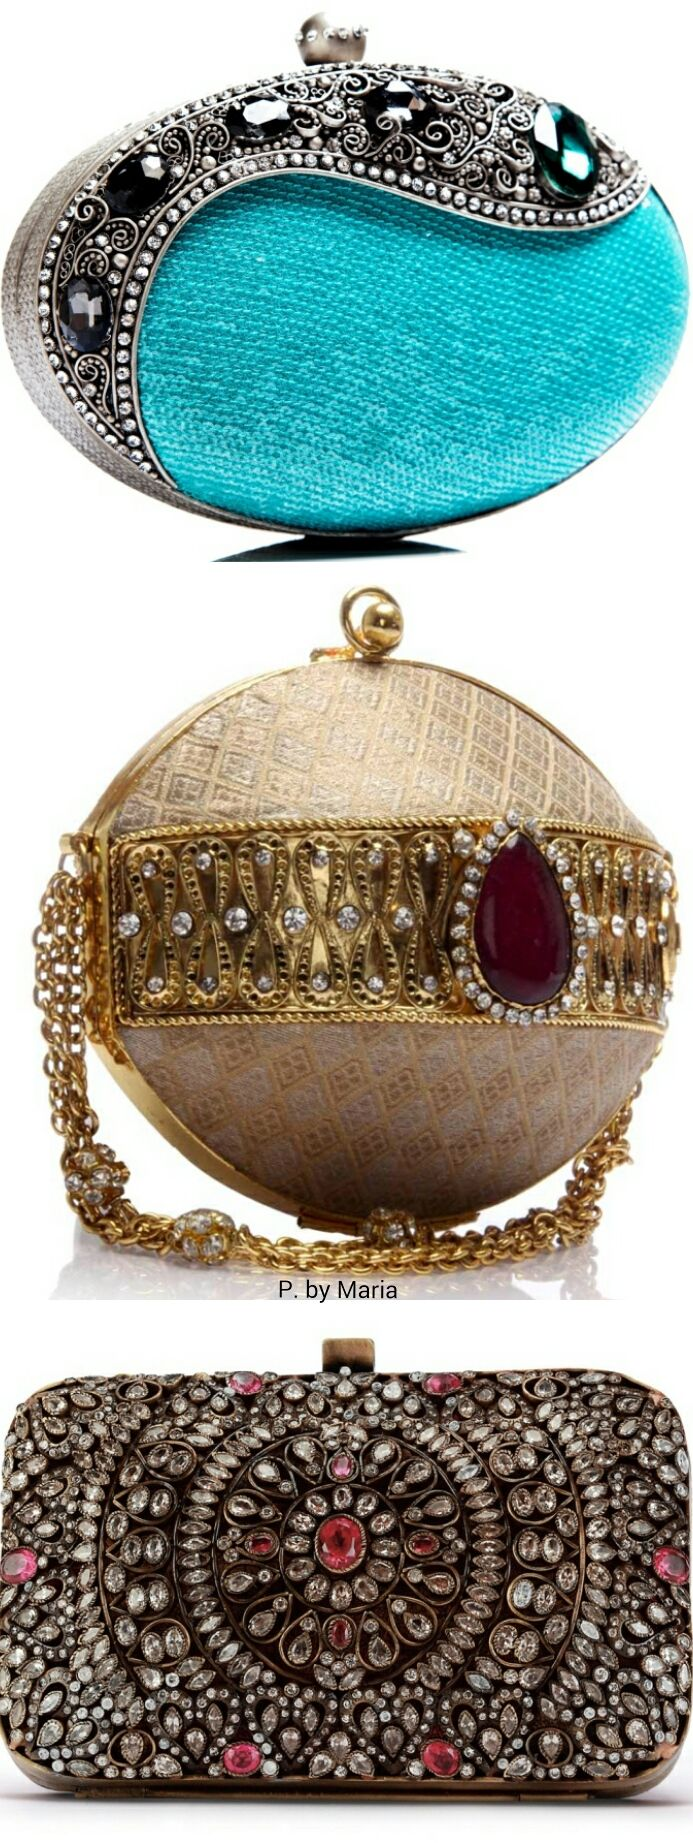 Fashion Accessories   Clutches   Rosamaria G Frangini    Meera Mahadevia   Clutch Bags